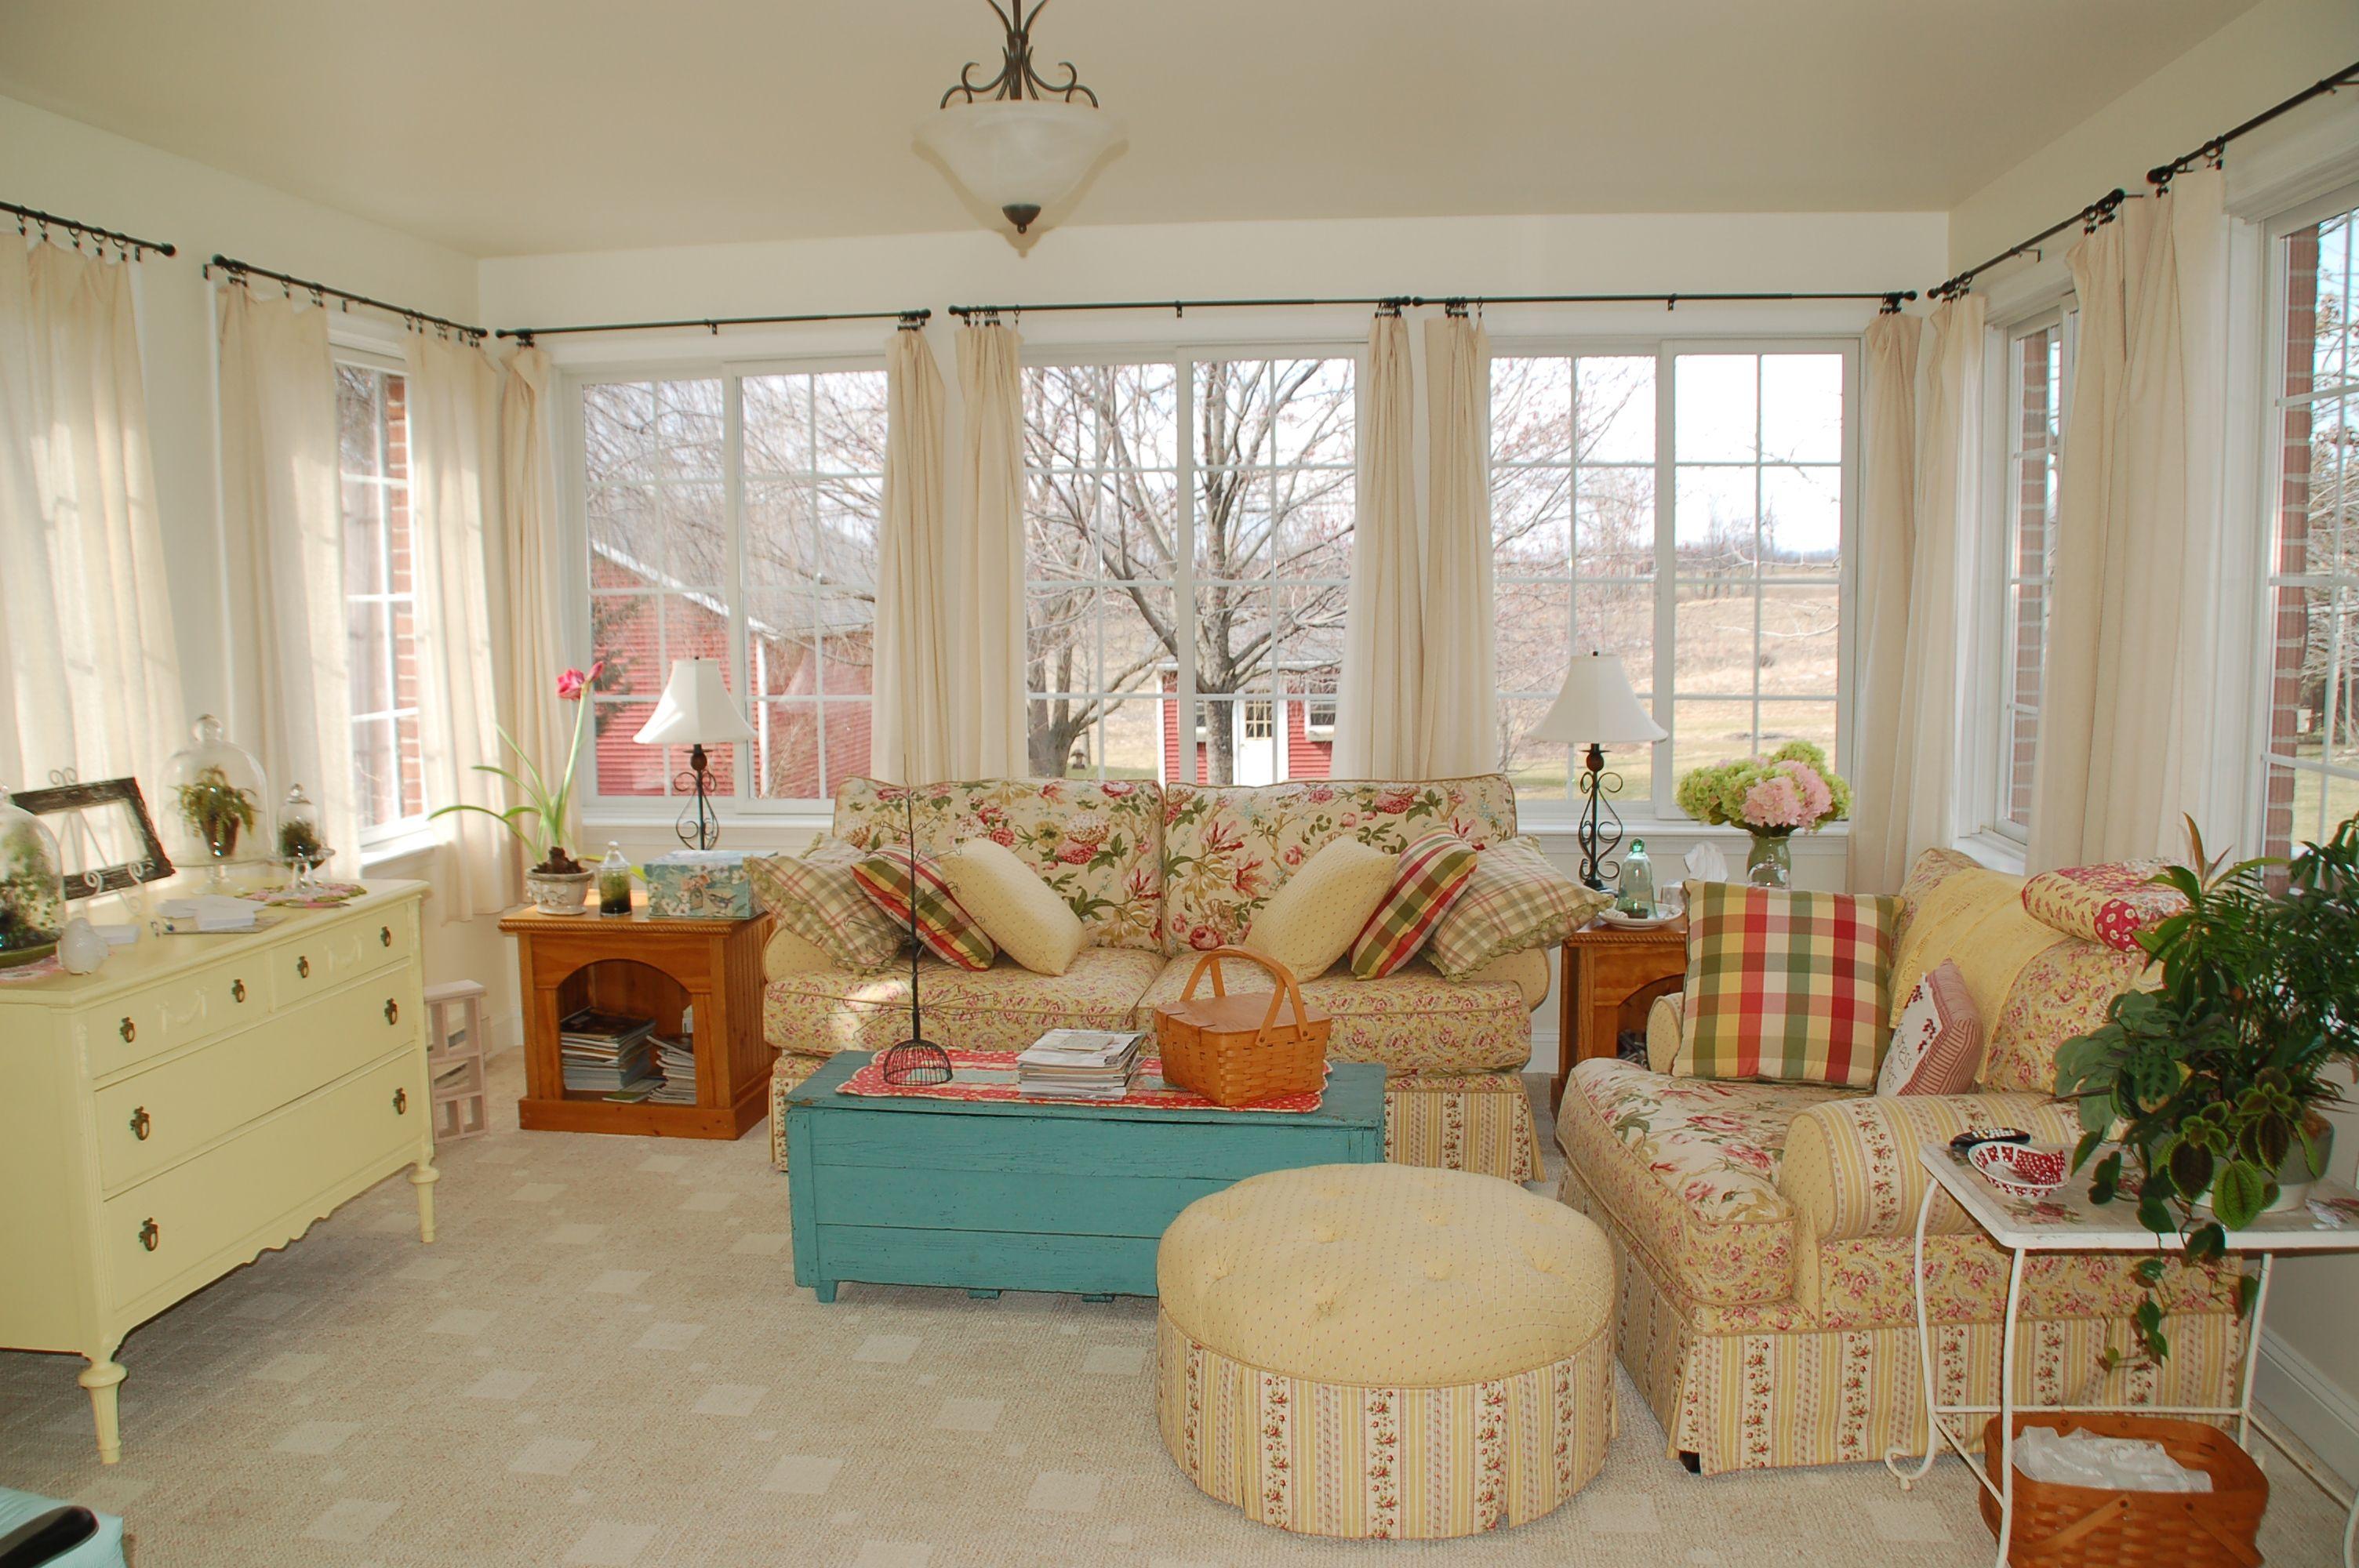 Window ideas for a sunroom  sunroom  cottage  pinterest  sunroom decor and beautiful